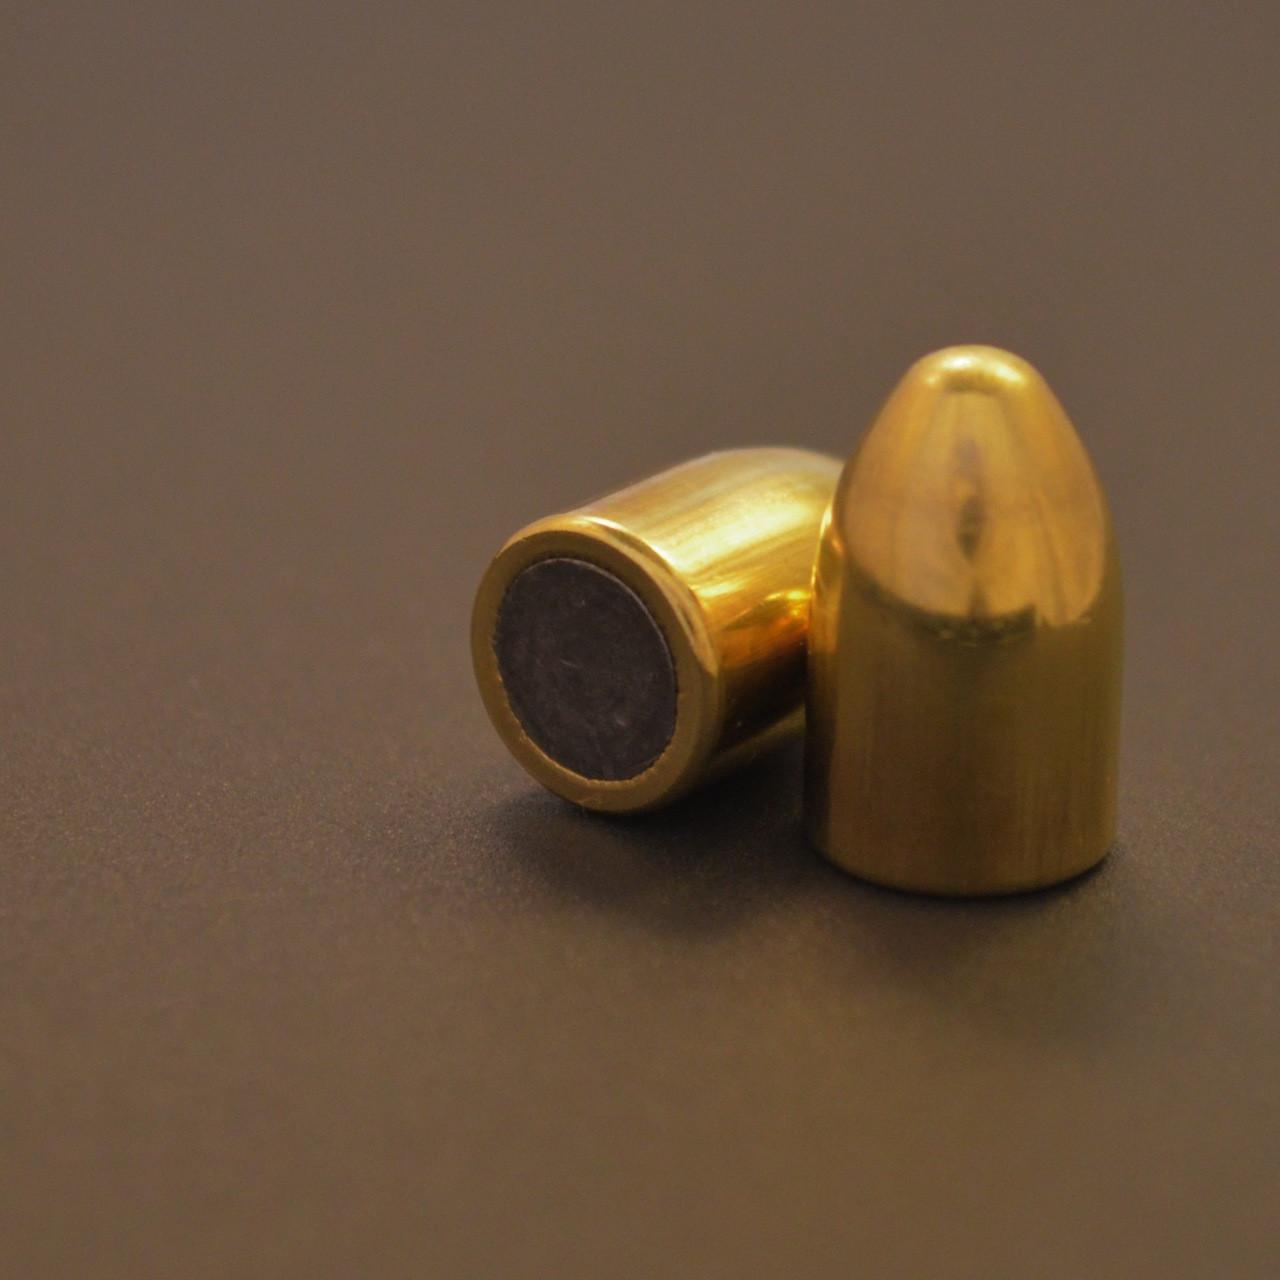 9mm/124gr FMJ -100ct